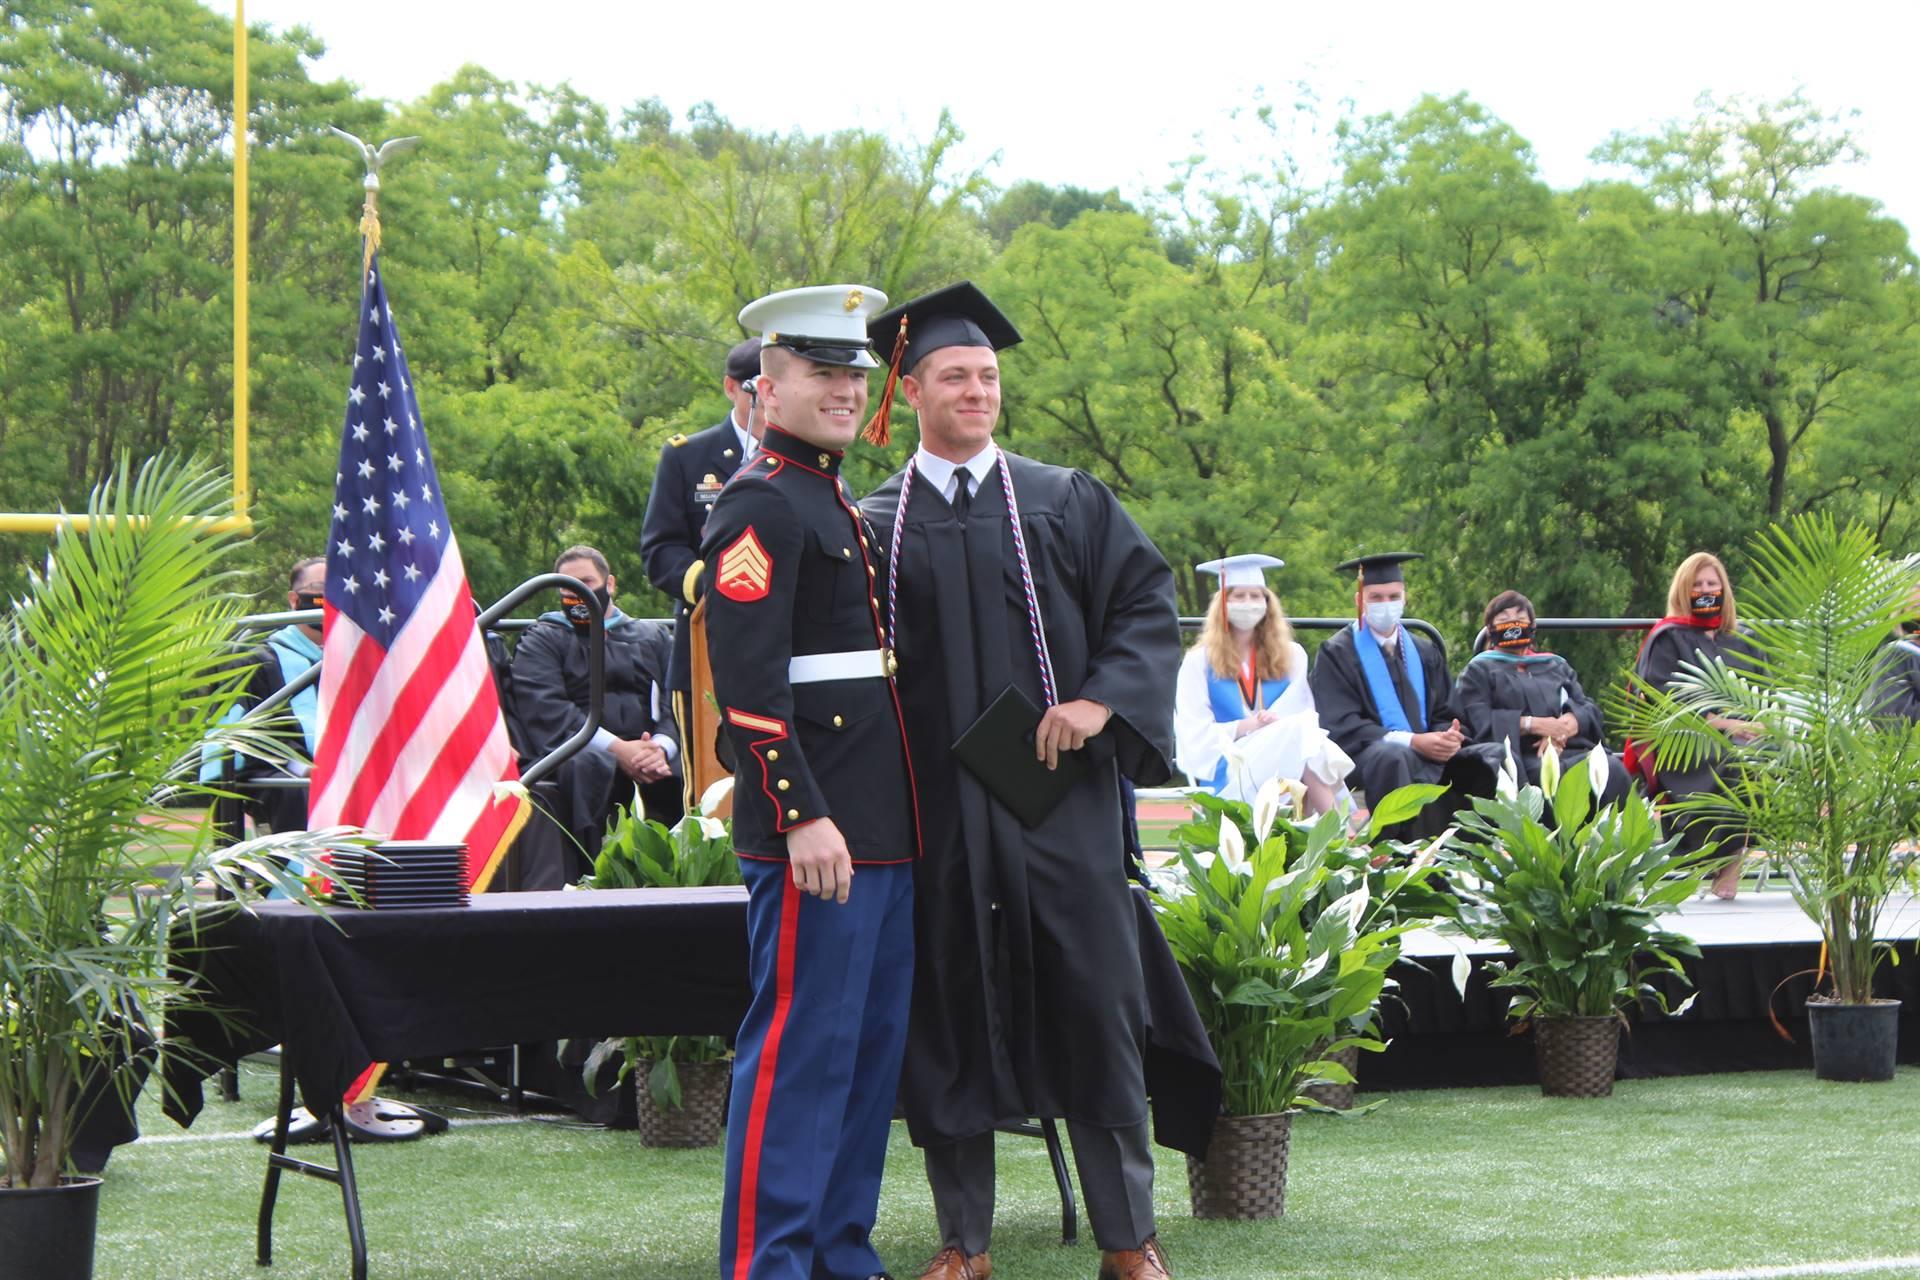 Military graduate